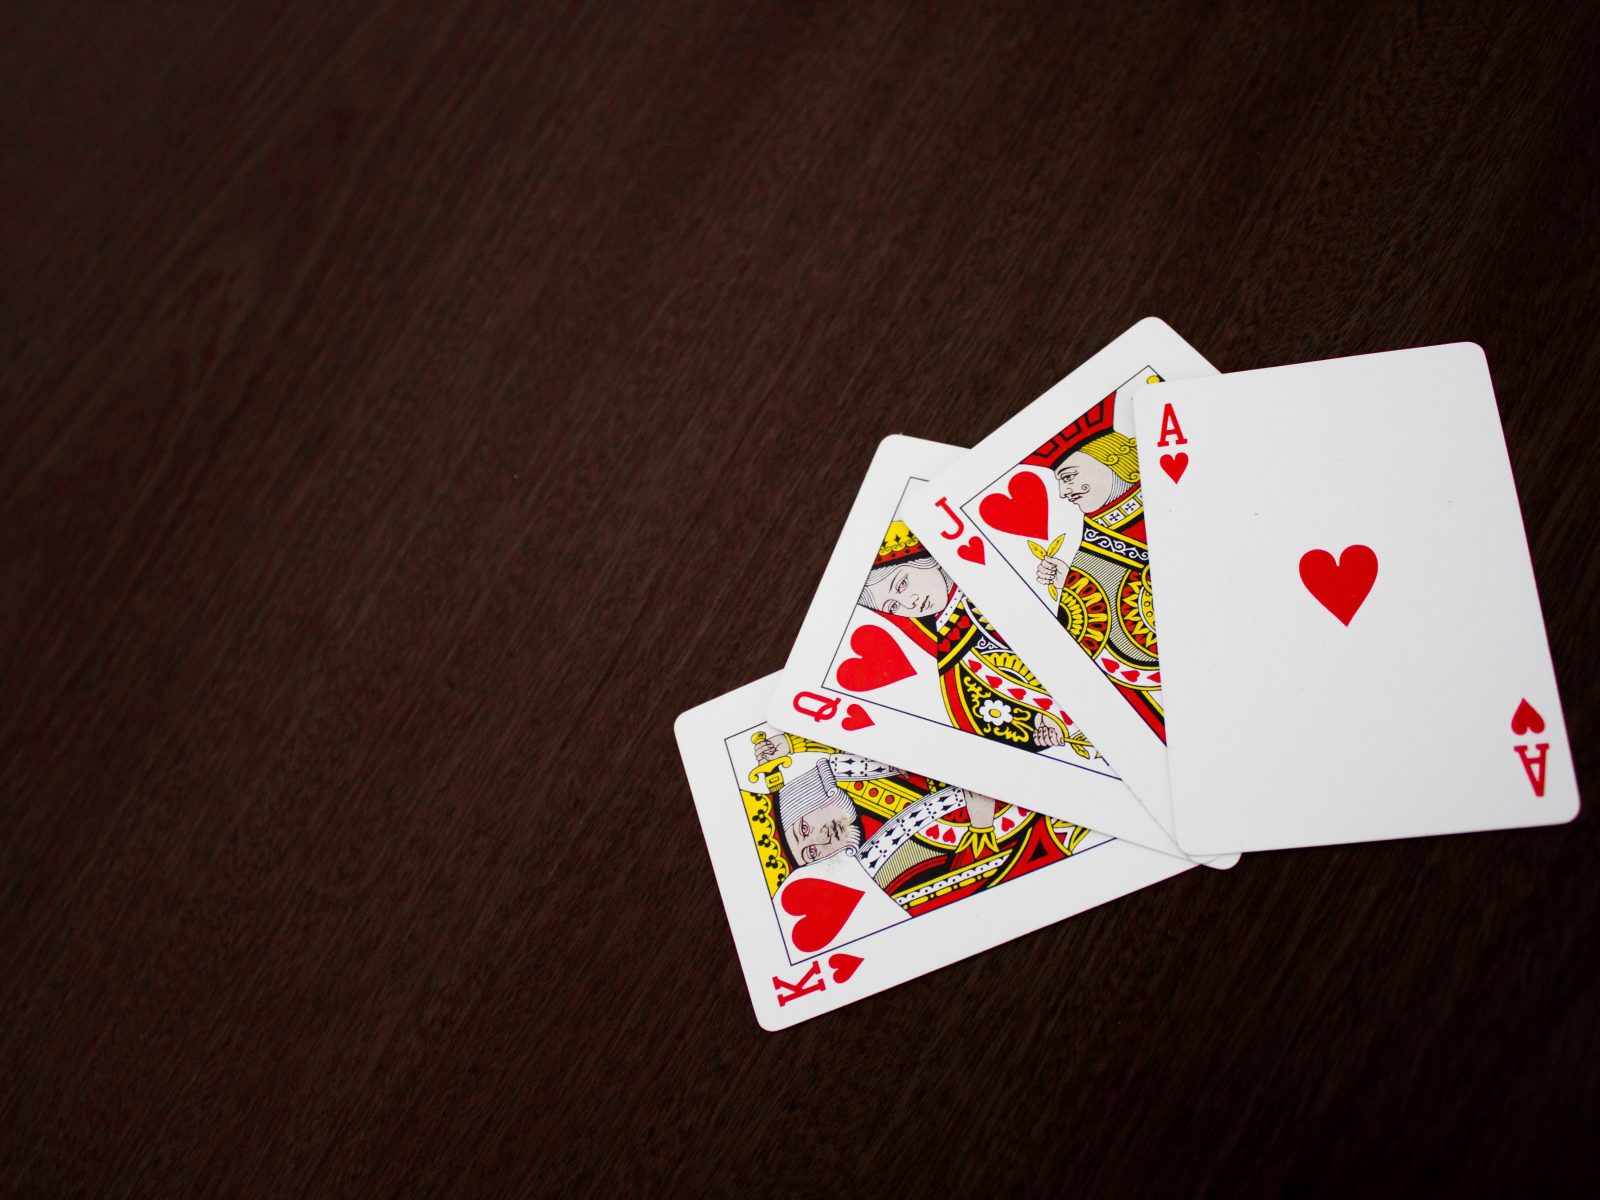 Playing Cards Wallpaper 4K 5K Background | HD Wallpaper